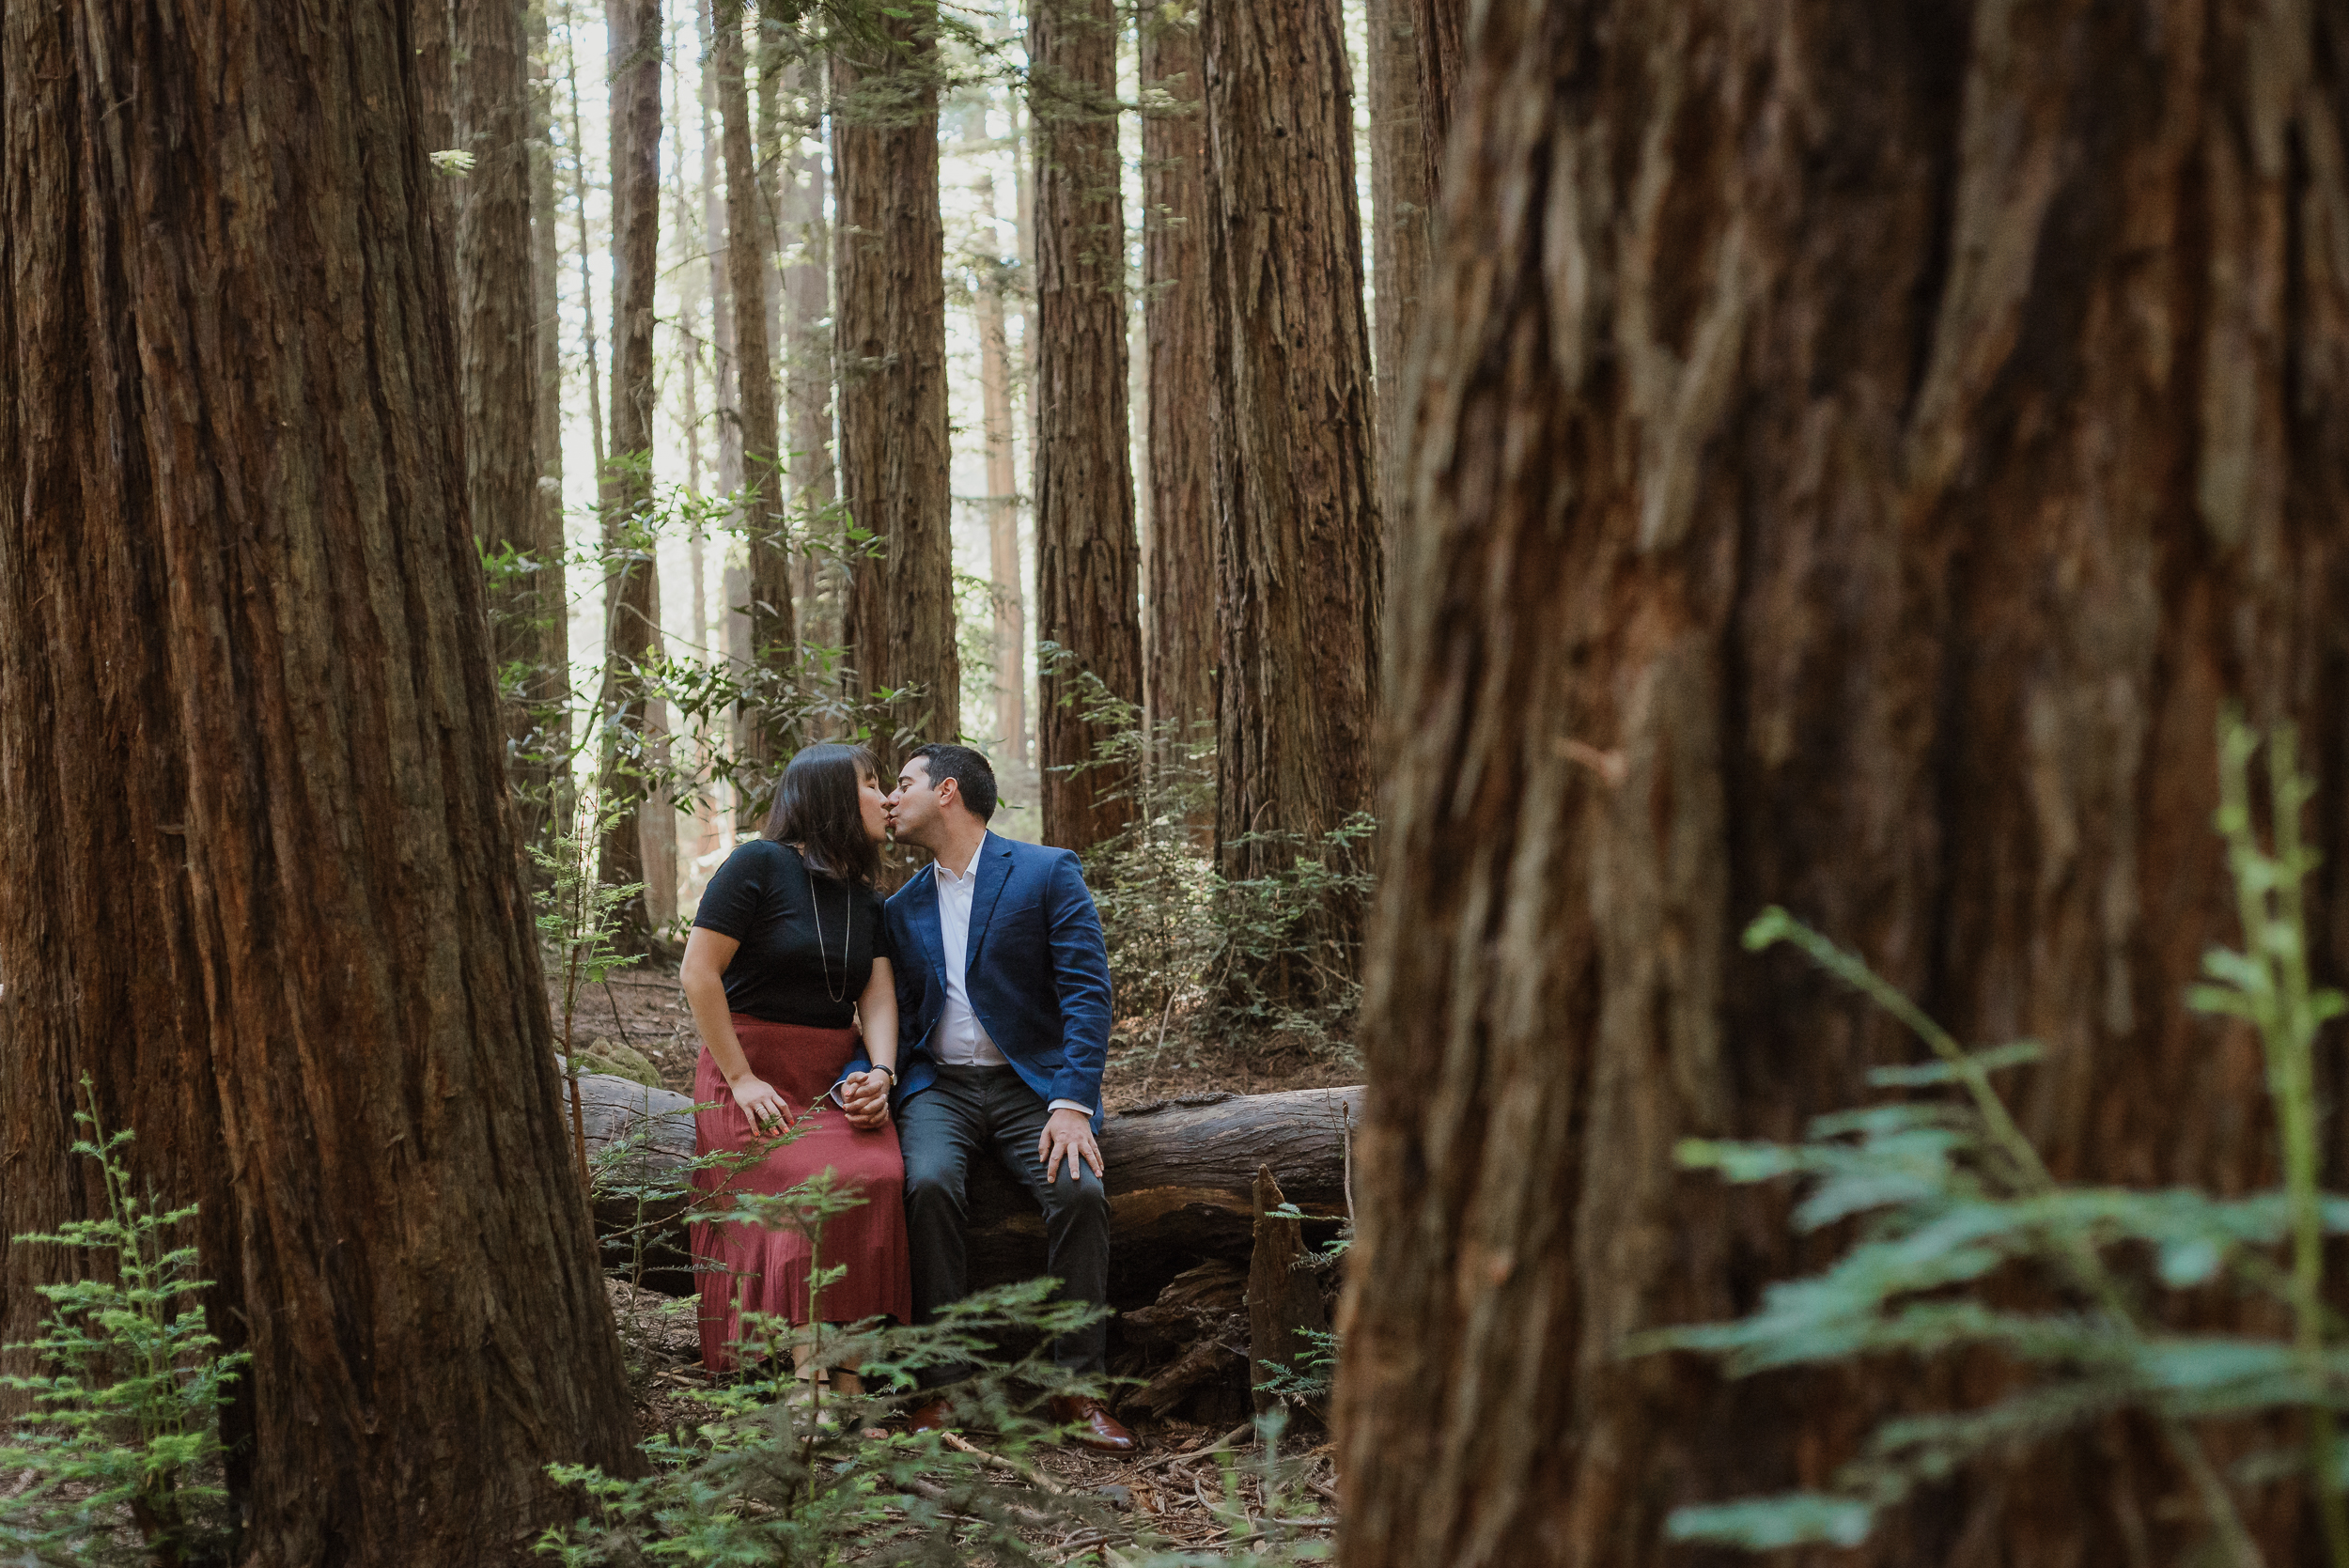 oakland-redwood-engagement-session-photographer-vivianchen-049.jpg